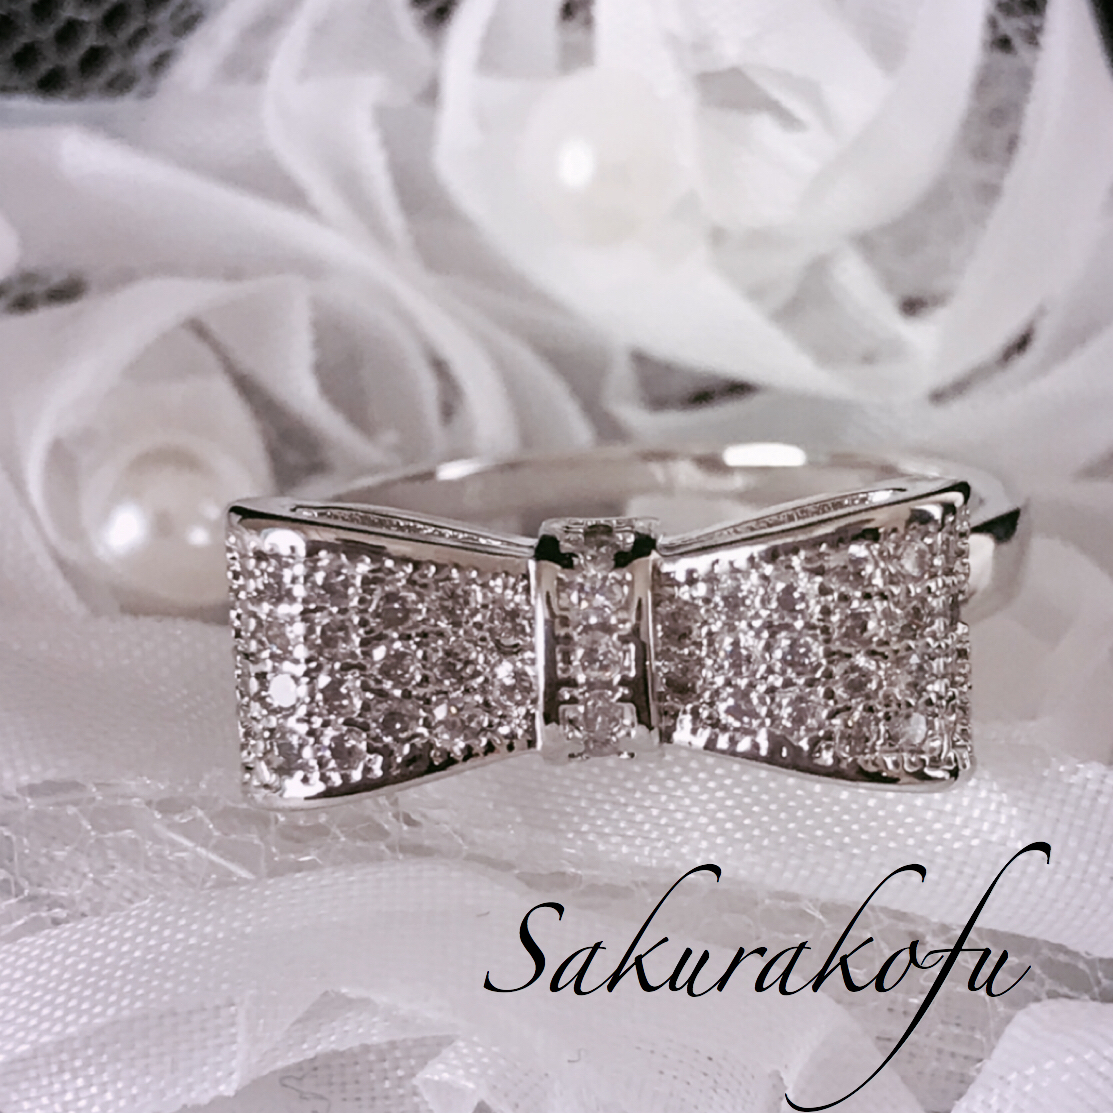 D006 送料無料 レディース 指輪 アクセサリー リボン Ribbon Silver Ring Kawaii